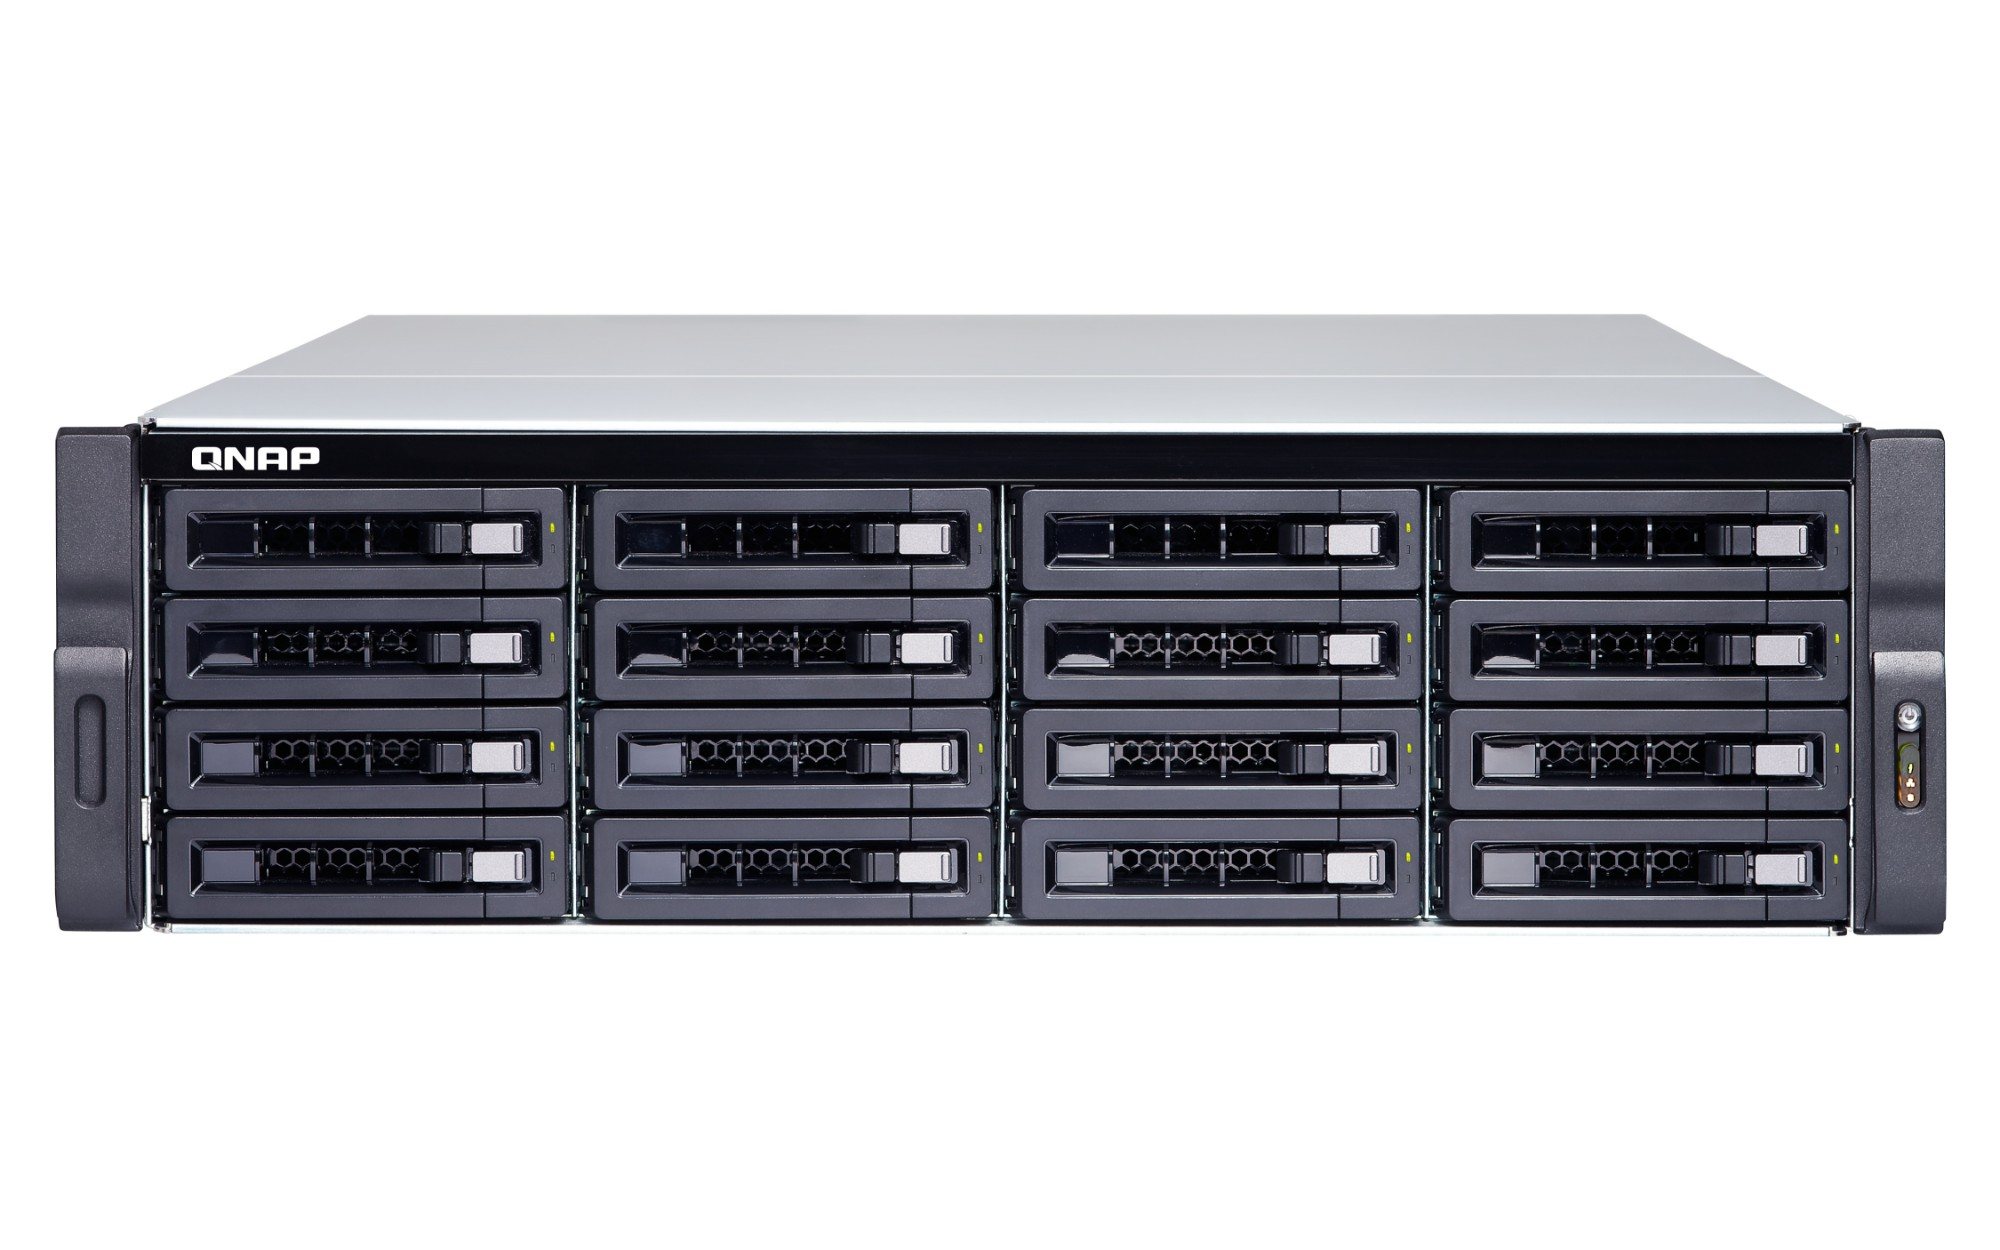 QNAP TS-1673U-RP-16G Ethernet LAN Rack (3U) Black NAS